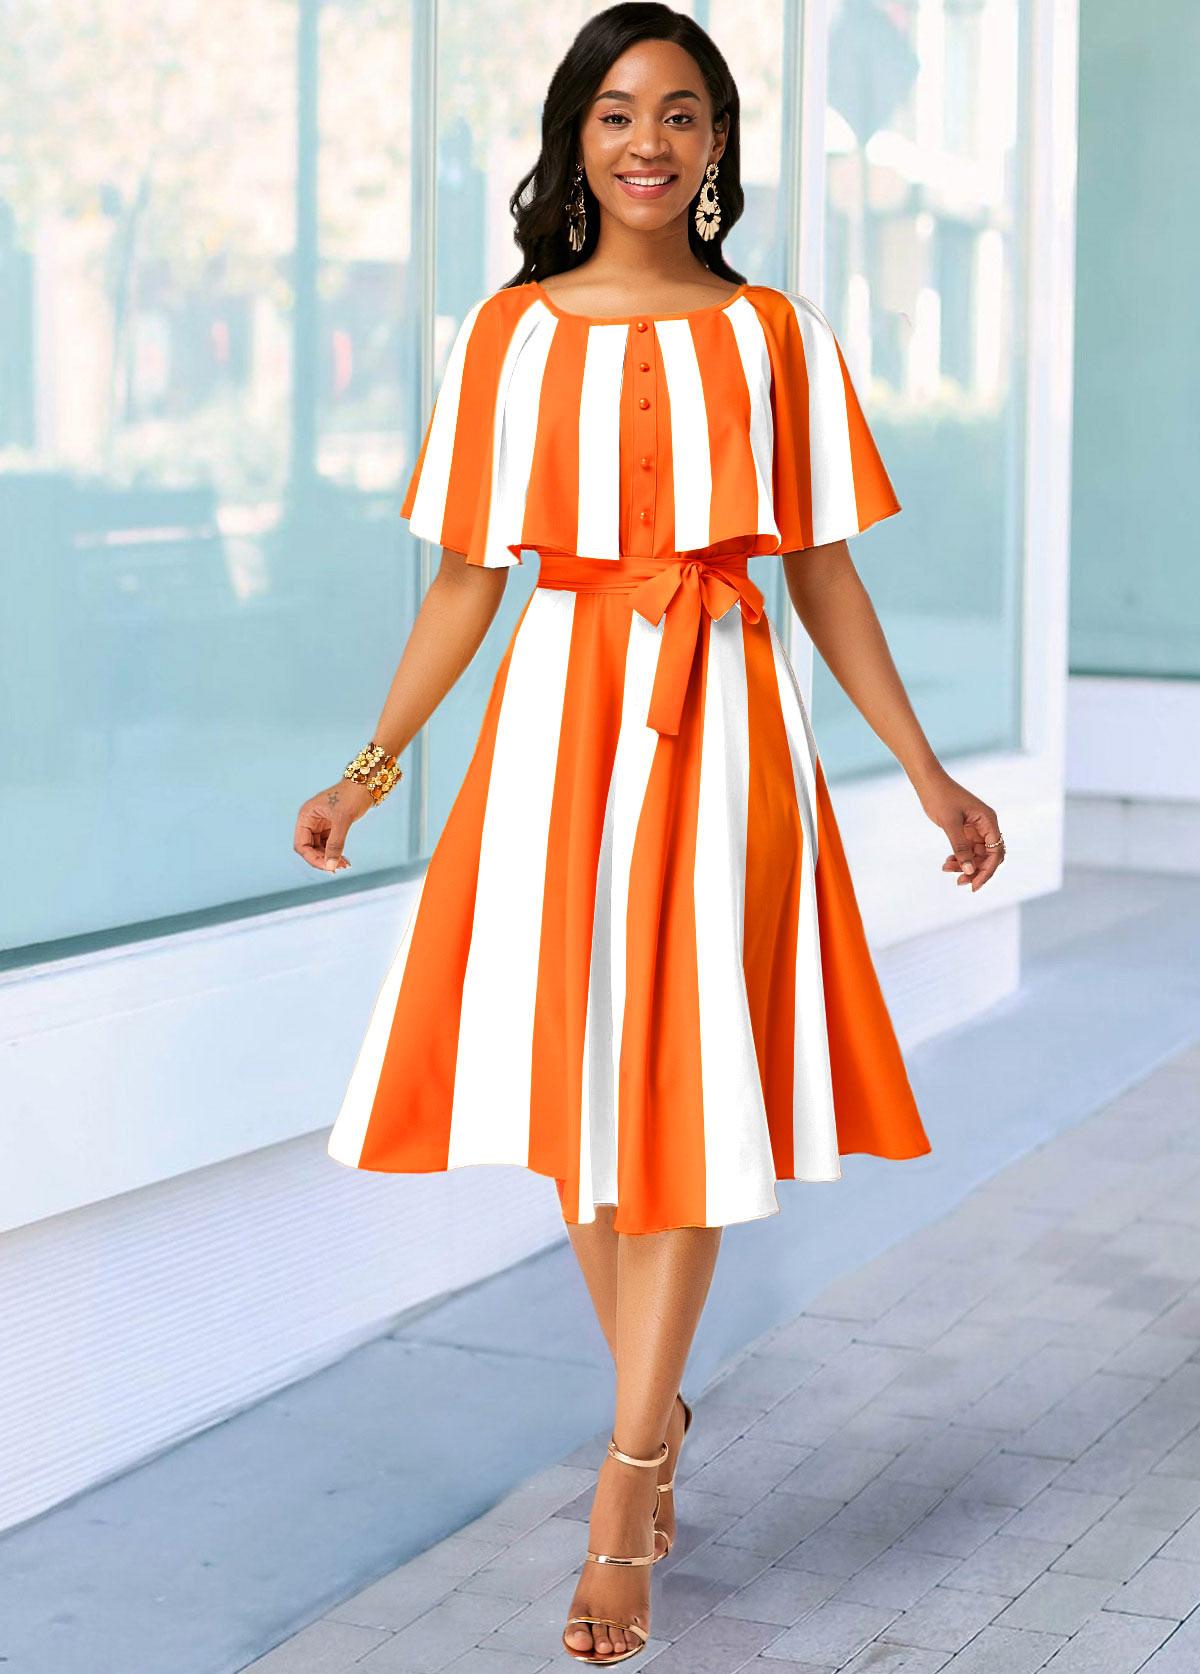 Belted Striped Cape Sleeve Orange Dress